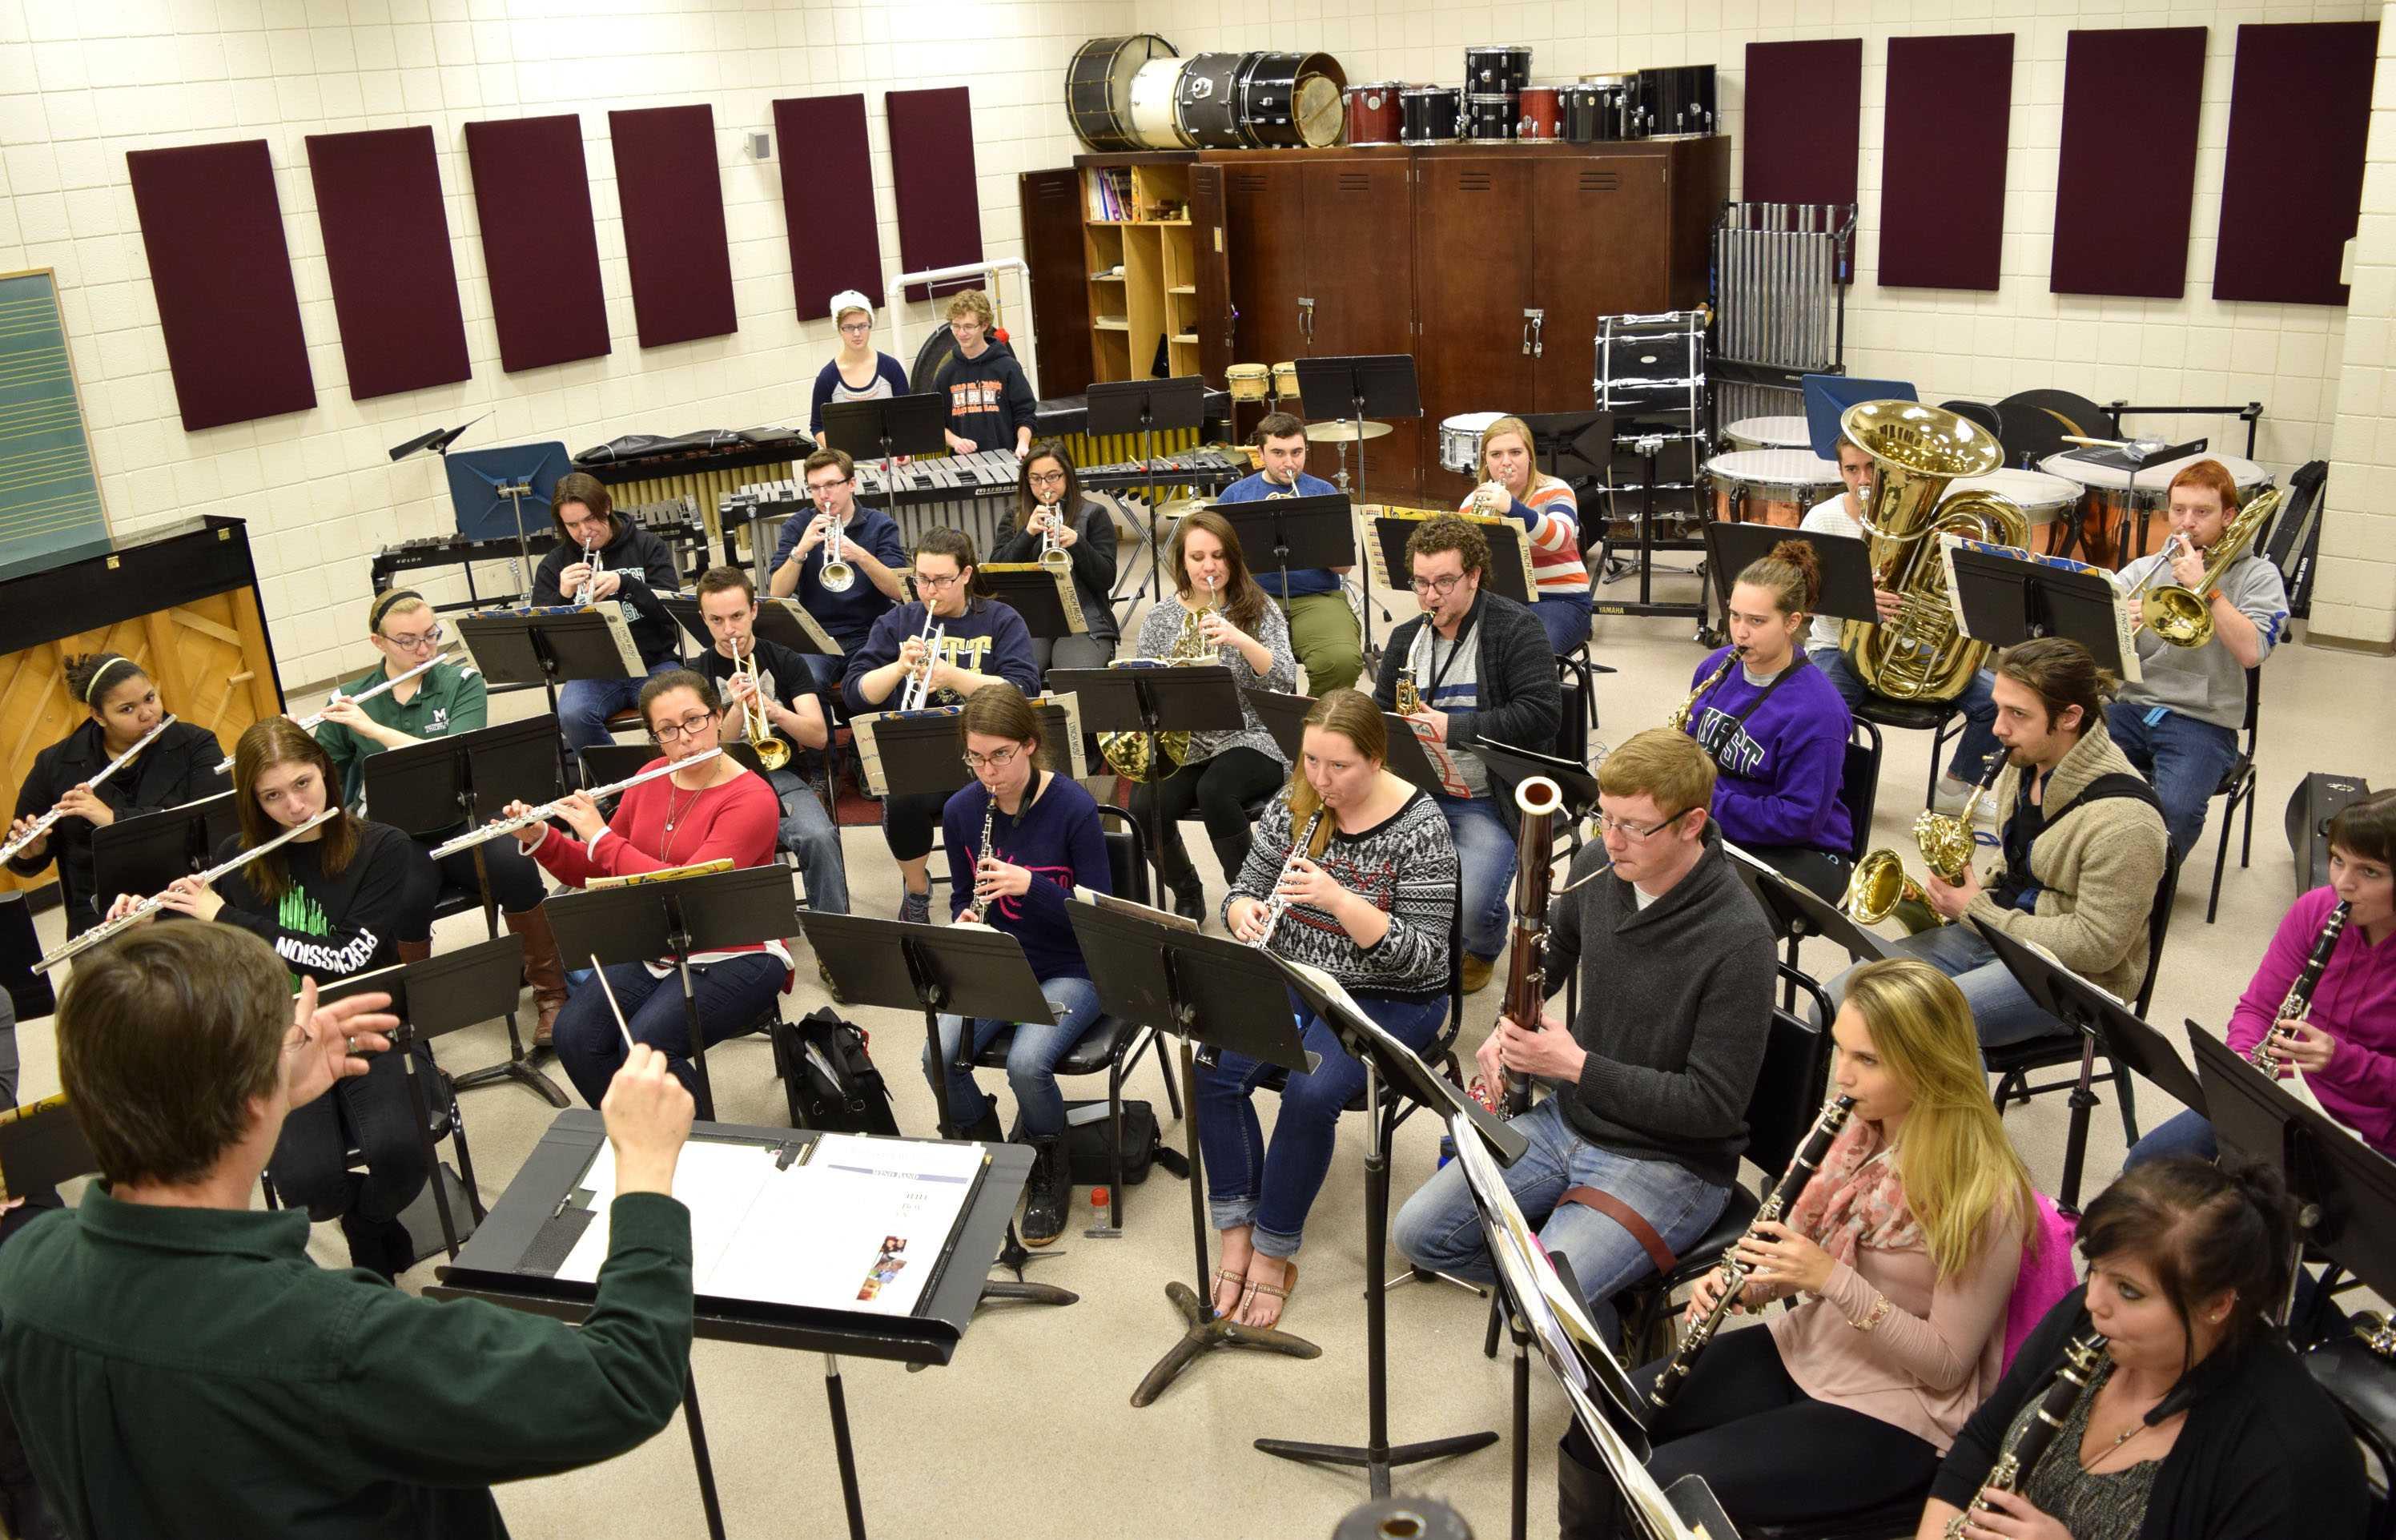 The Mercyhurst University Wind Ensemble rehearsing for the Tri-State Music Festival.